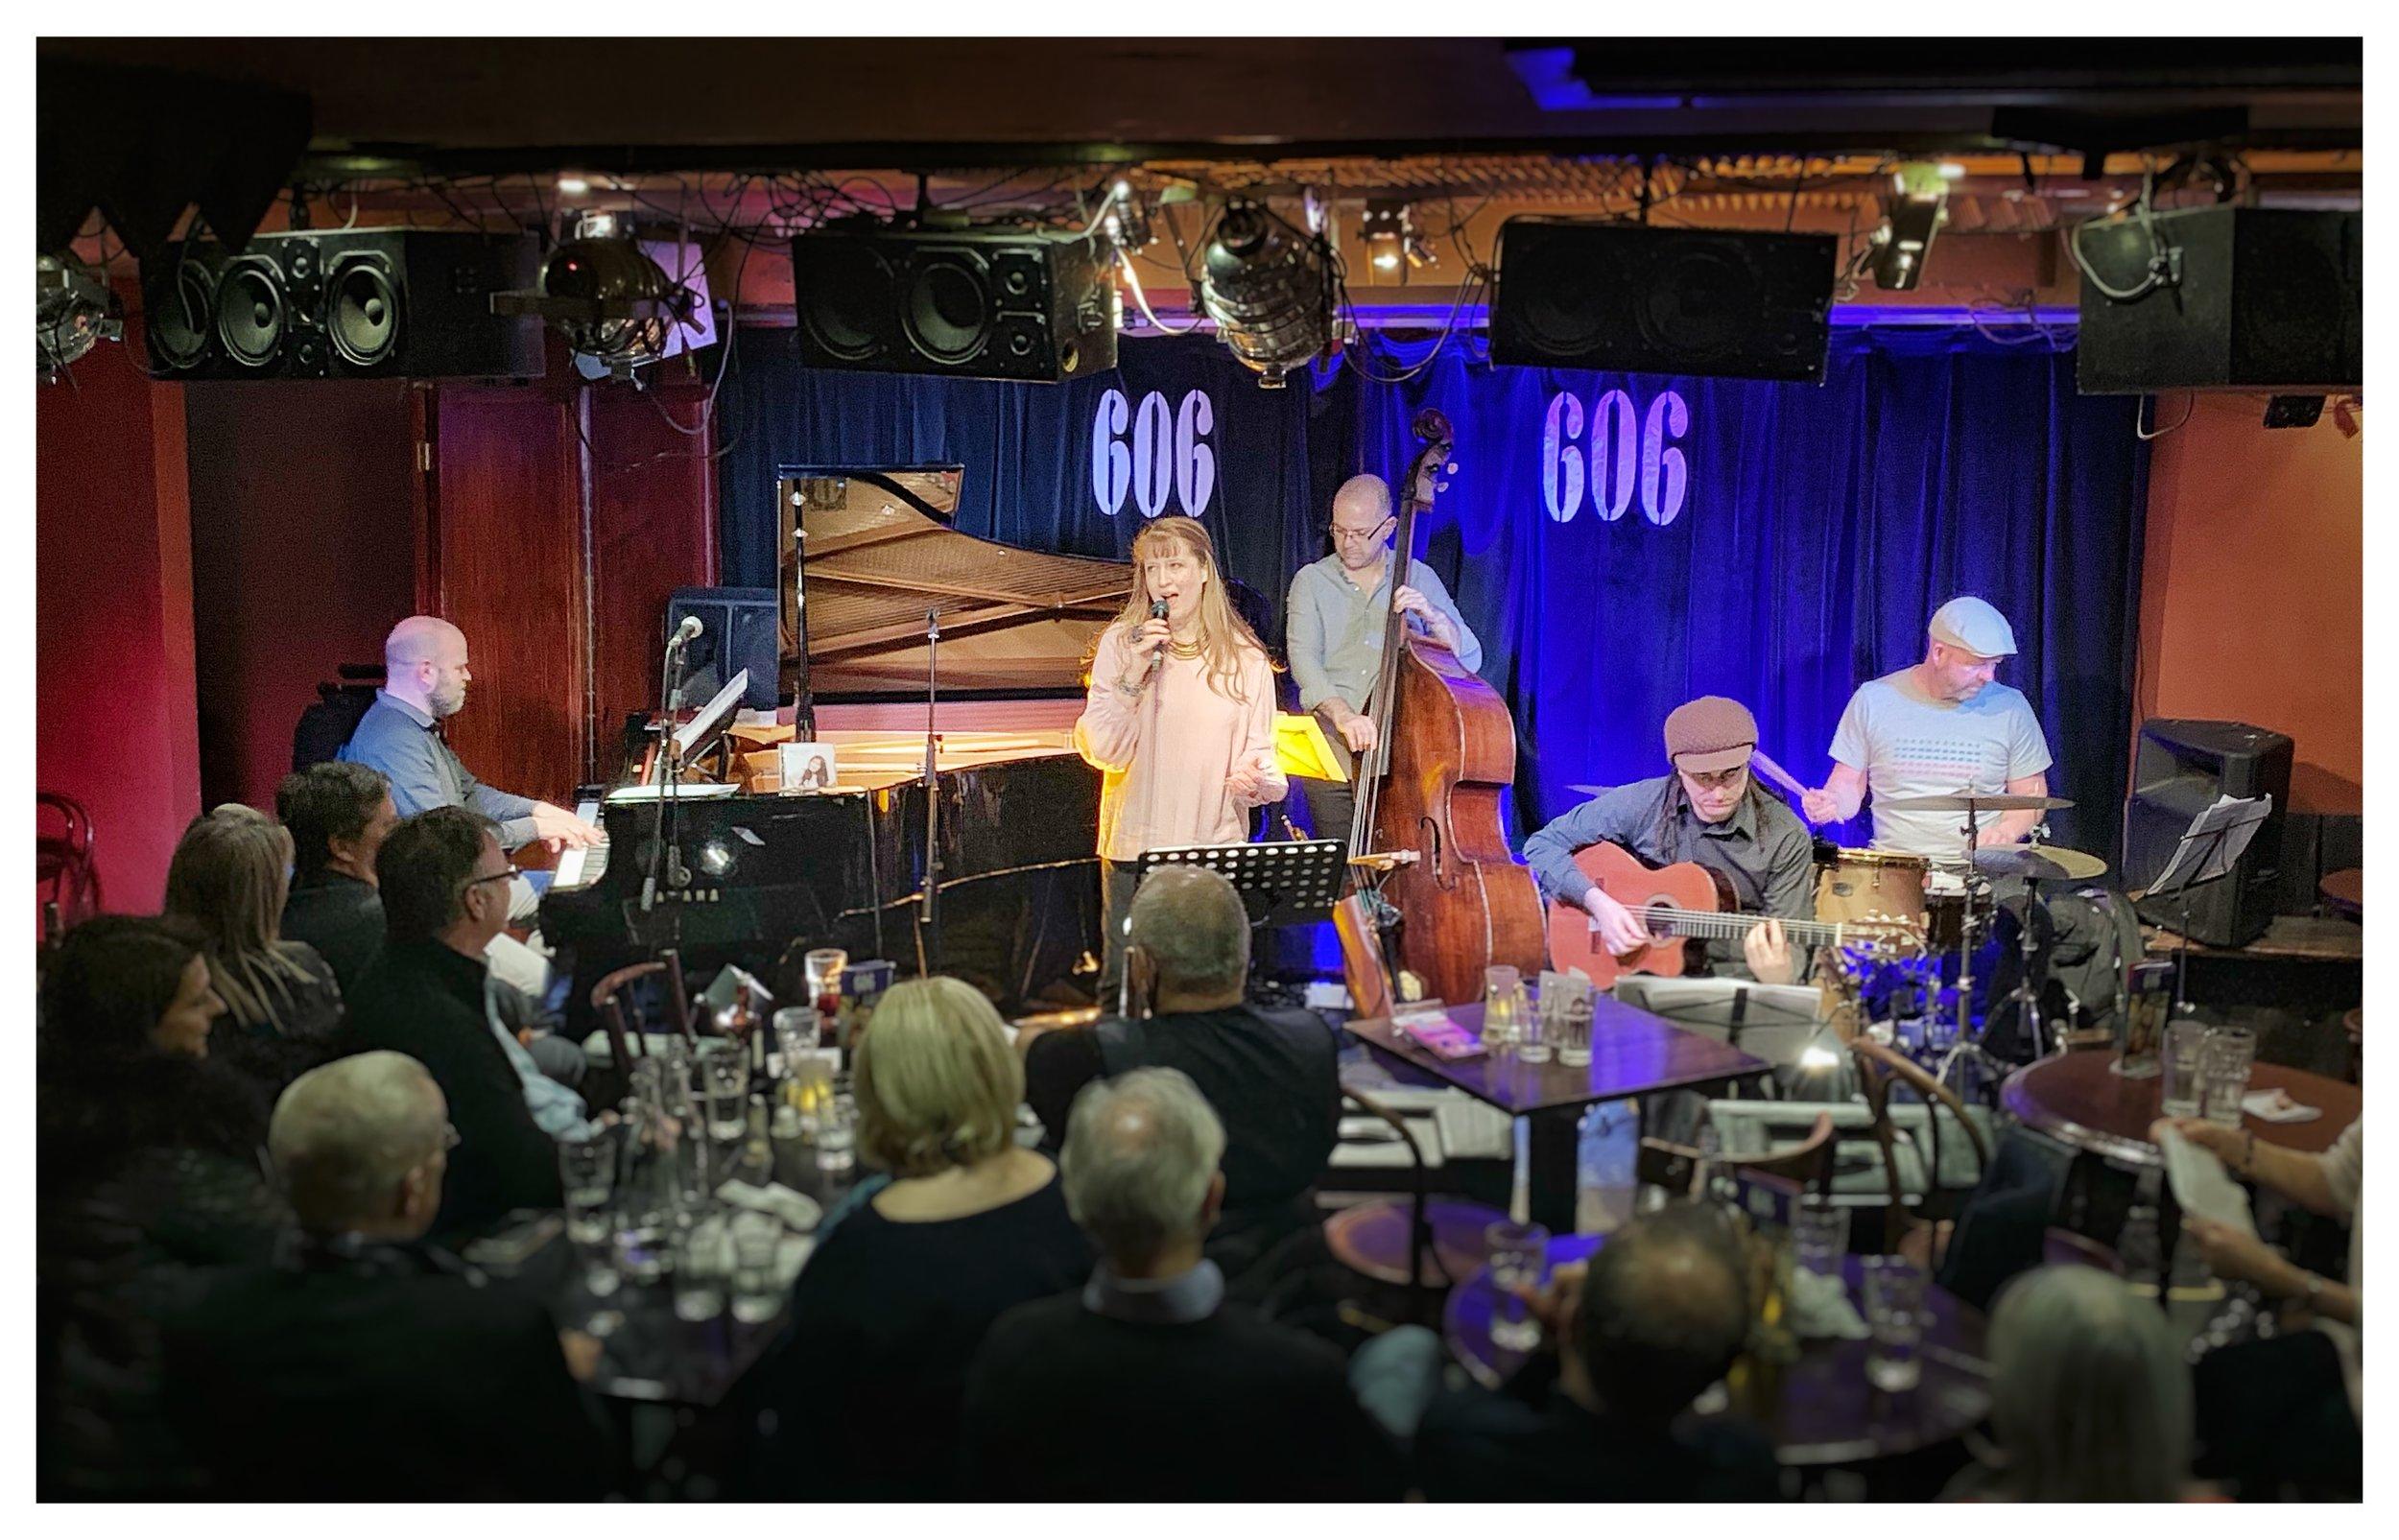 Daniela's Quintet performing at London's 606 Jazz Club (27/1/19)